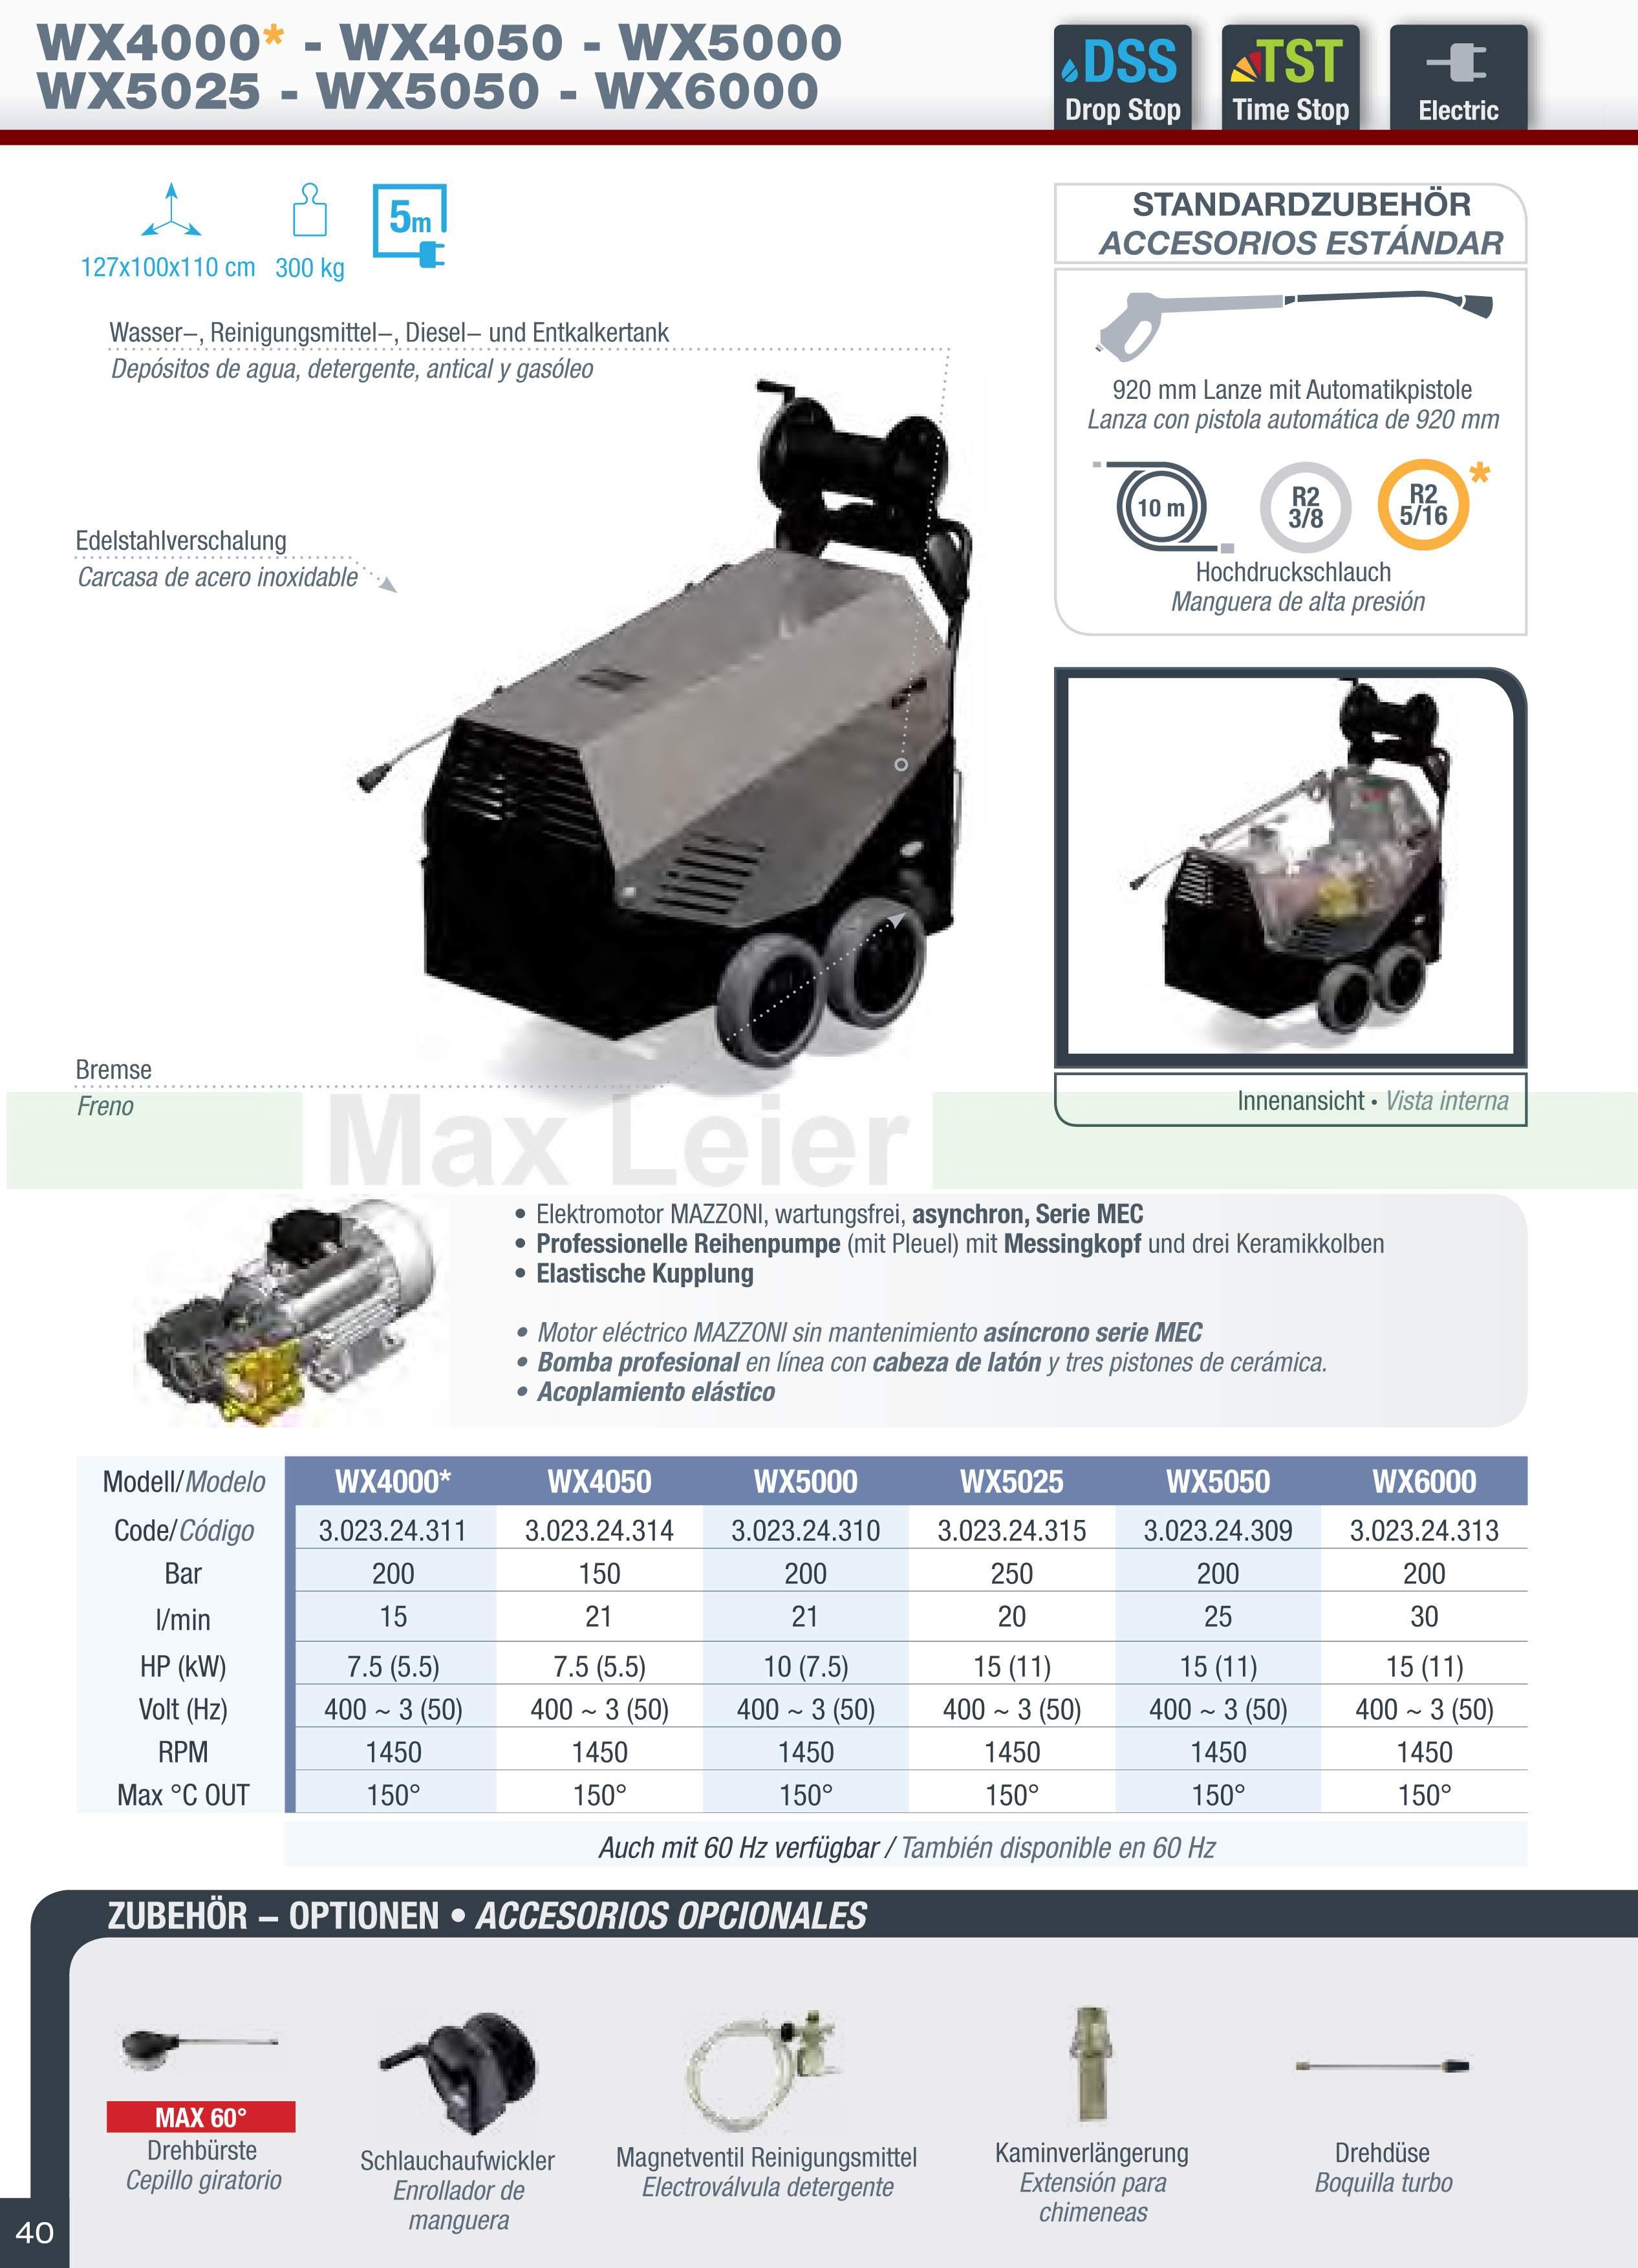 S40-Mazzoni-WX4000-WX4050-WX5000-WX5025-WX5050-WX6000